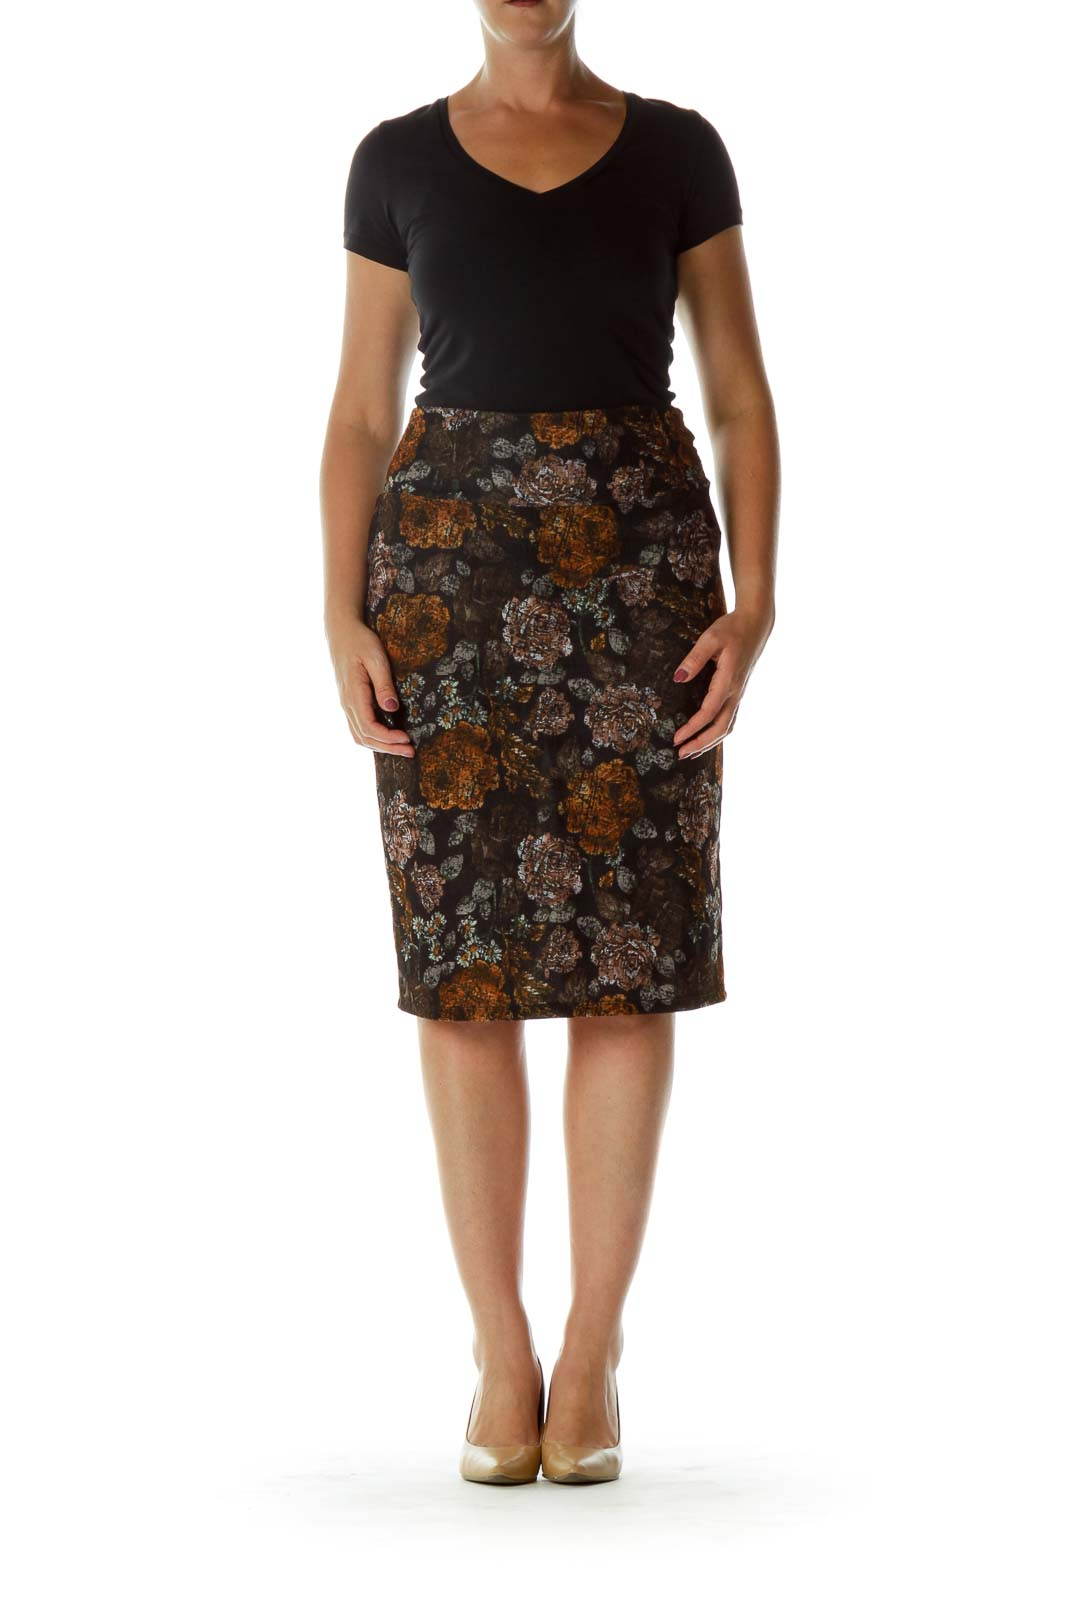 Black Floral Print Pencil Skirt